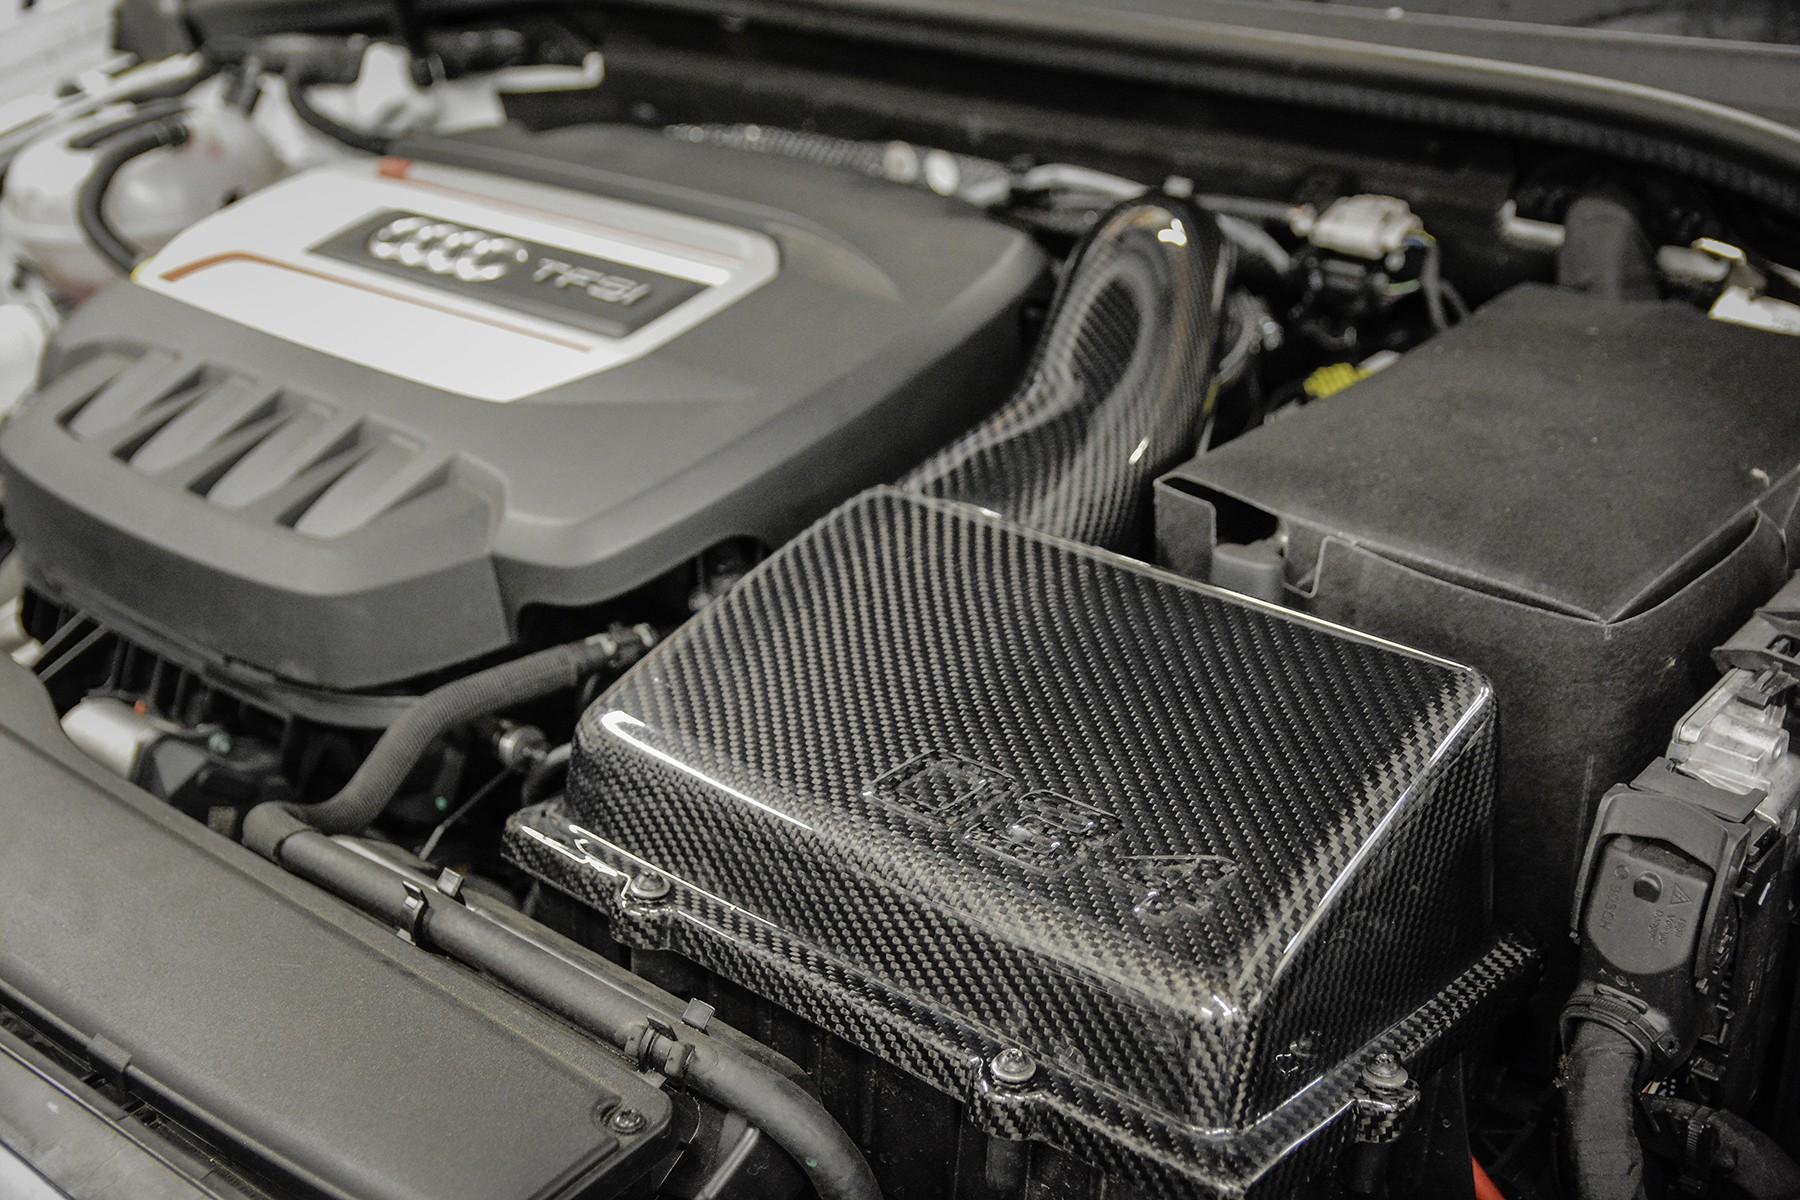 X34 Carbon Fiber Mqb Cold Air Intake System 8v Audi A3 S3 Tt Tts 1999volkswagenbeetleenginediagram 1999 Vw Beetle Flangehoses Mk7 Volkswagen Golf Gti R Installed 034